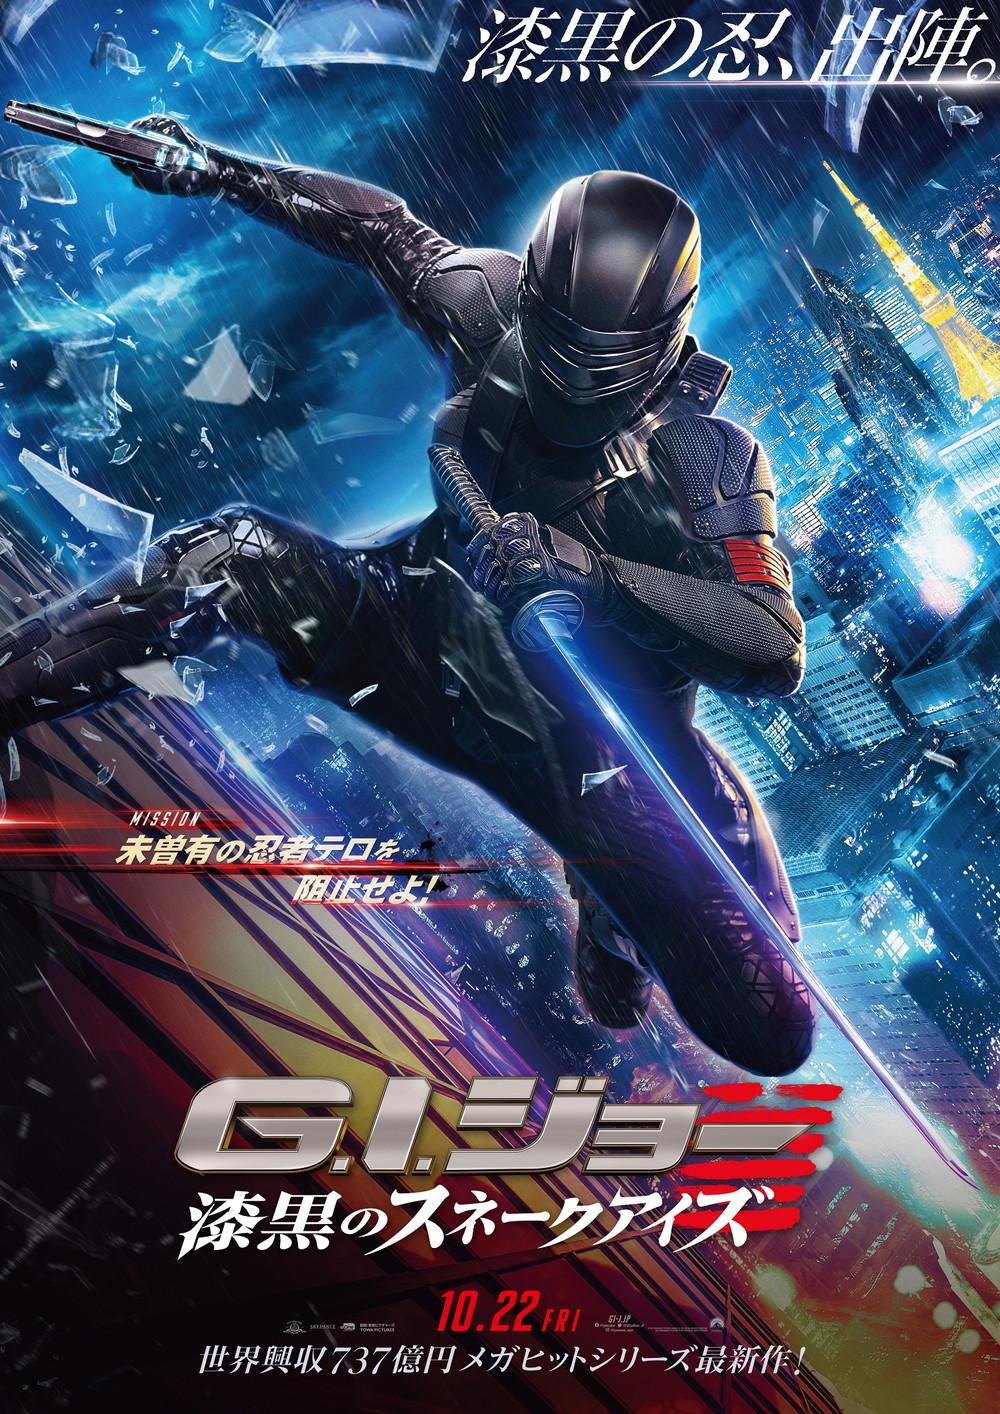 『G.I.ジョー:漆黒のスネークアイズ』poster